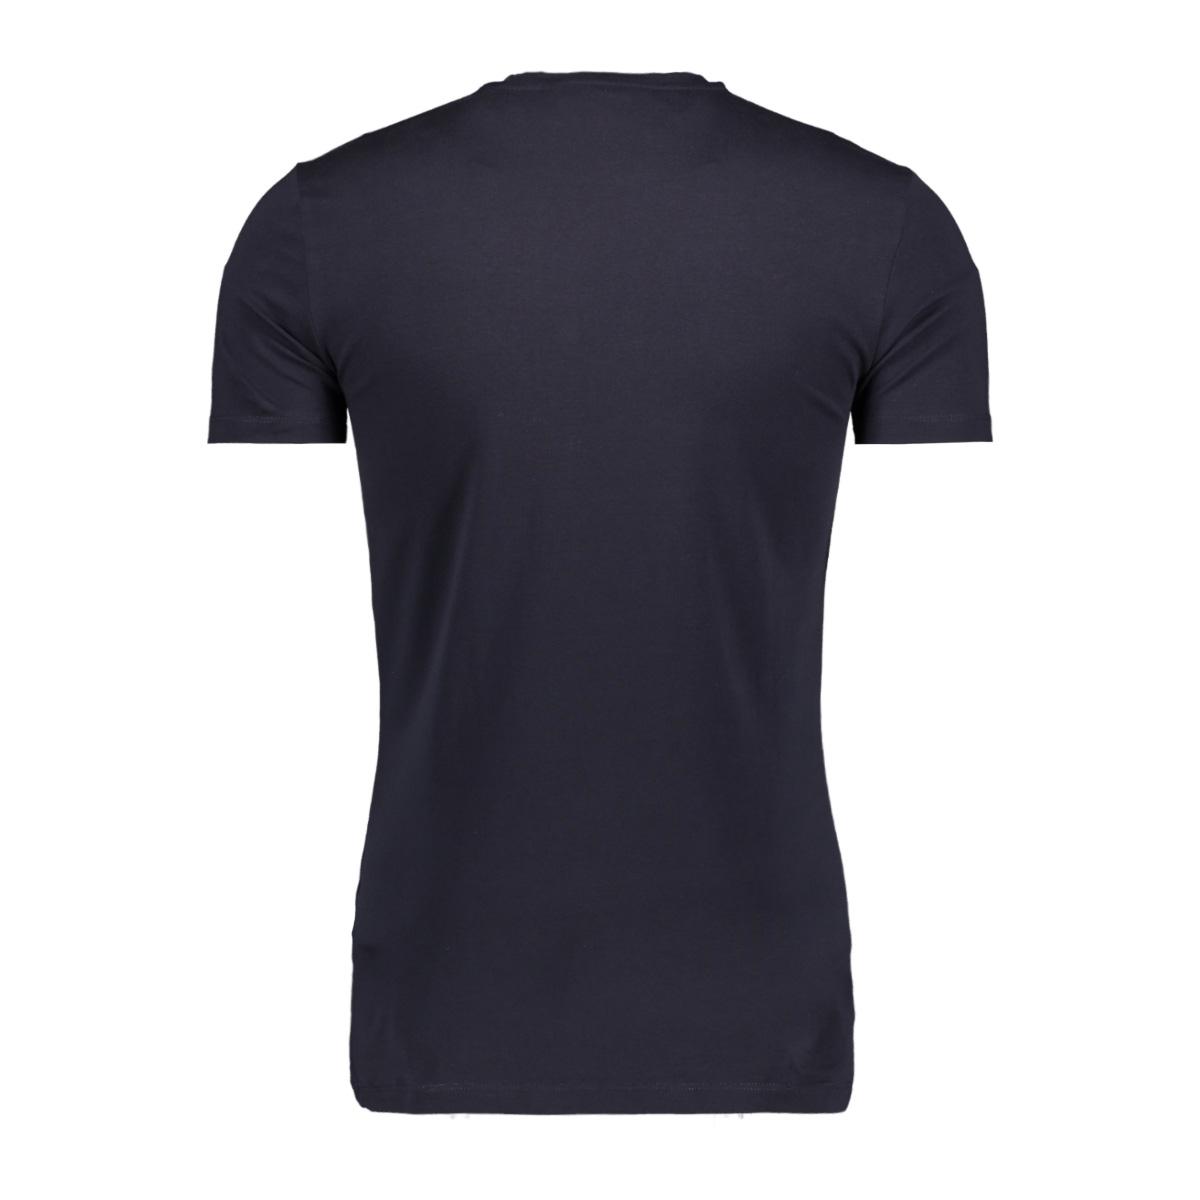 t shirt with print mmks01717 antony morato t-shirt 7073 blue ink